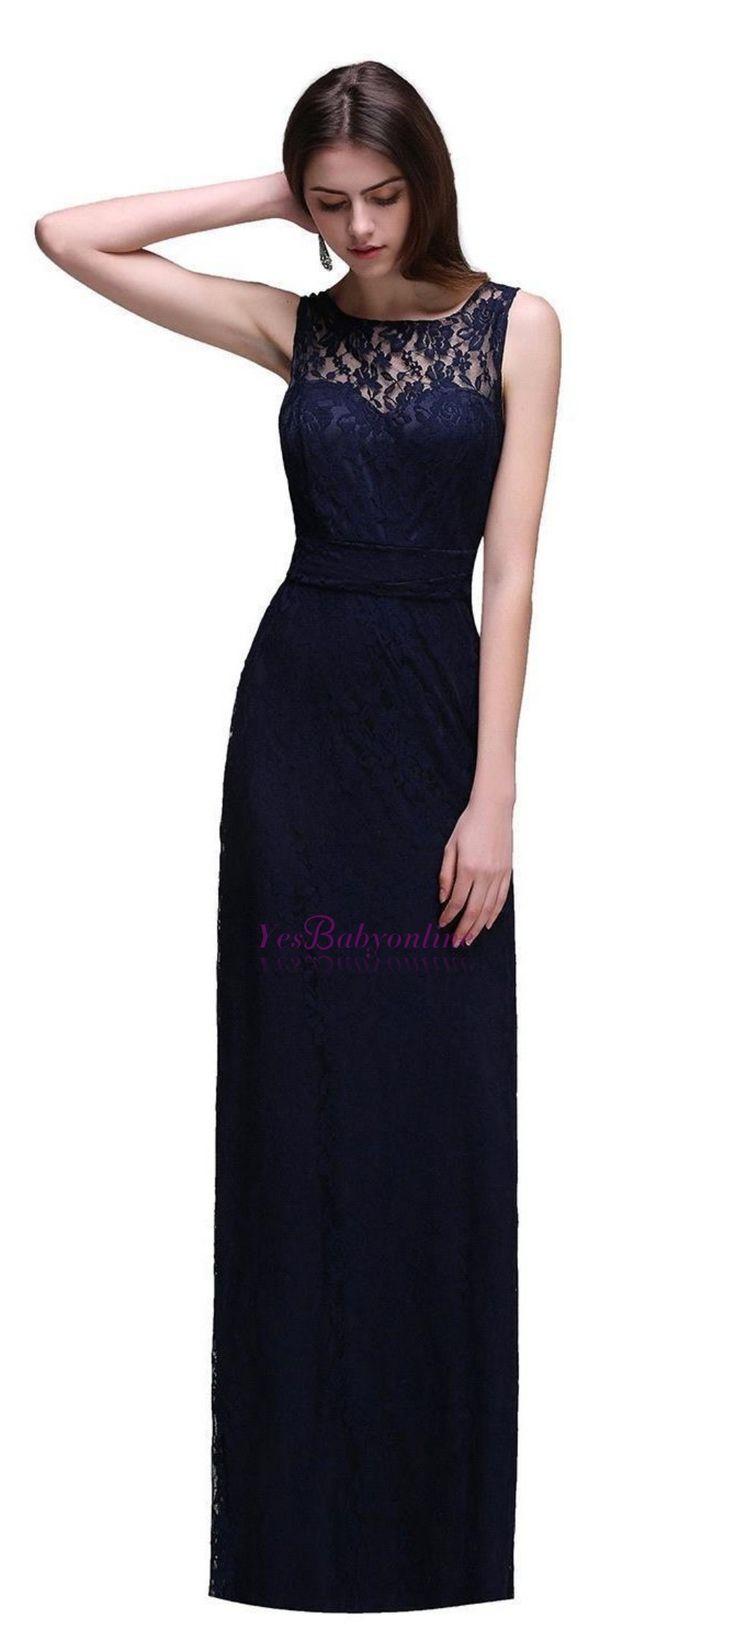 $89-Simple Dark Navy Lace Bridesmaid Dresses Sleeveless Sheath Long Prom Dresses